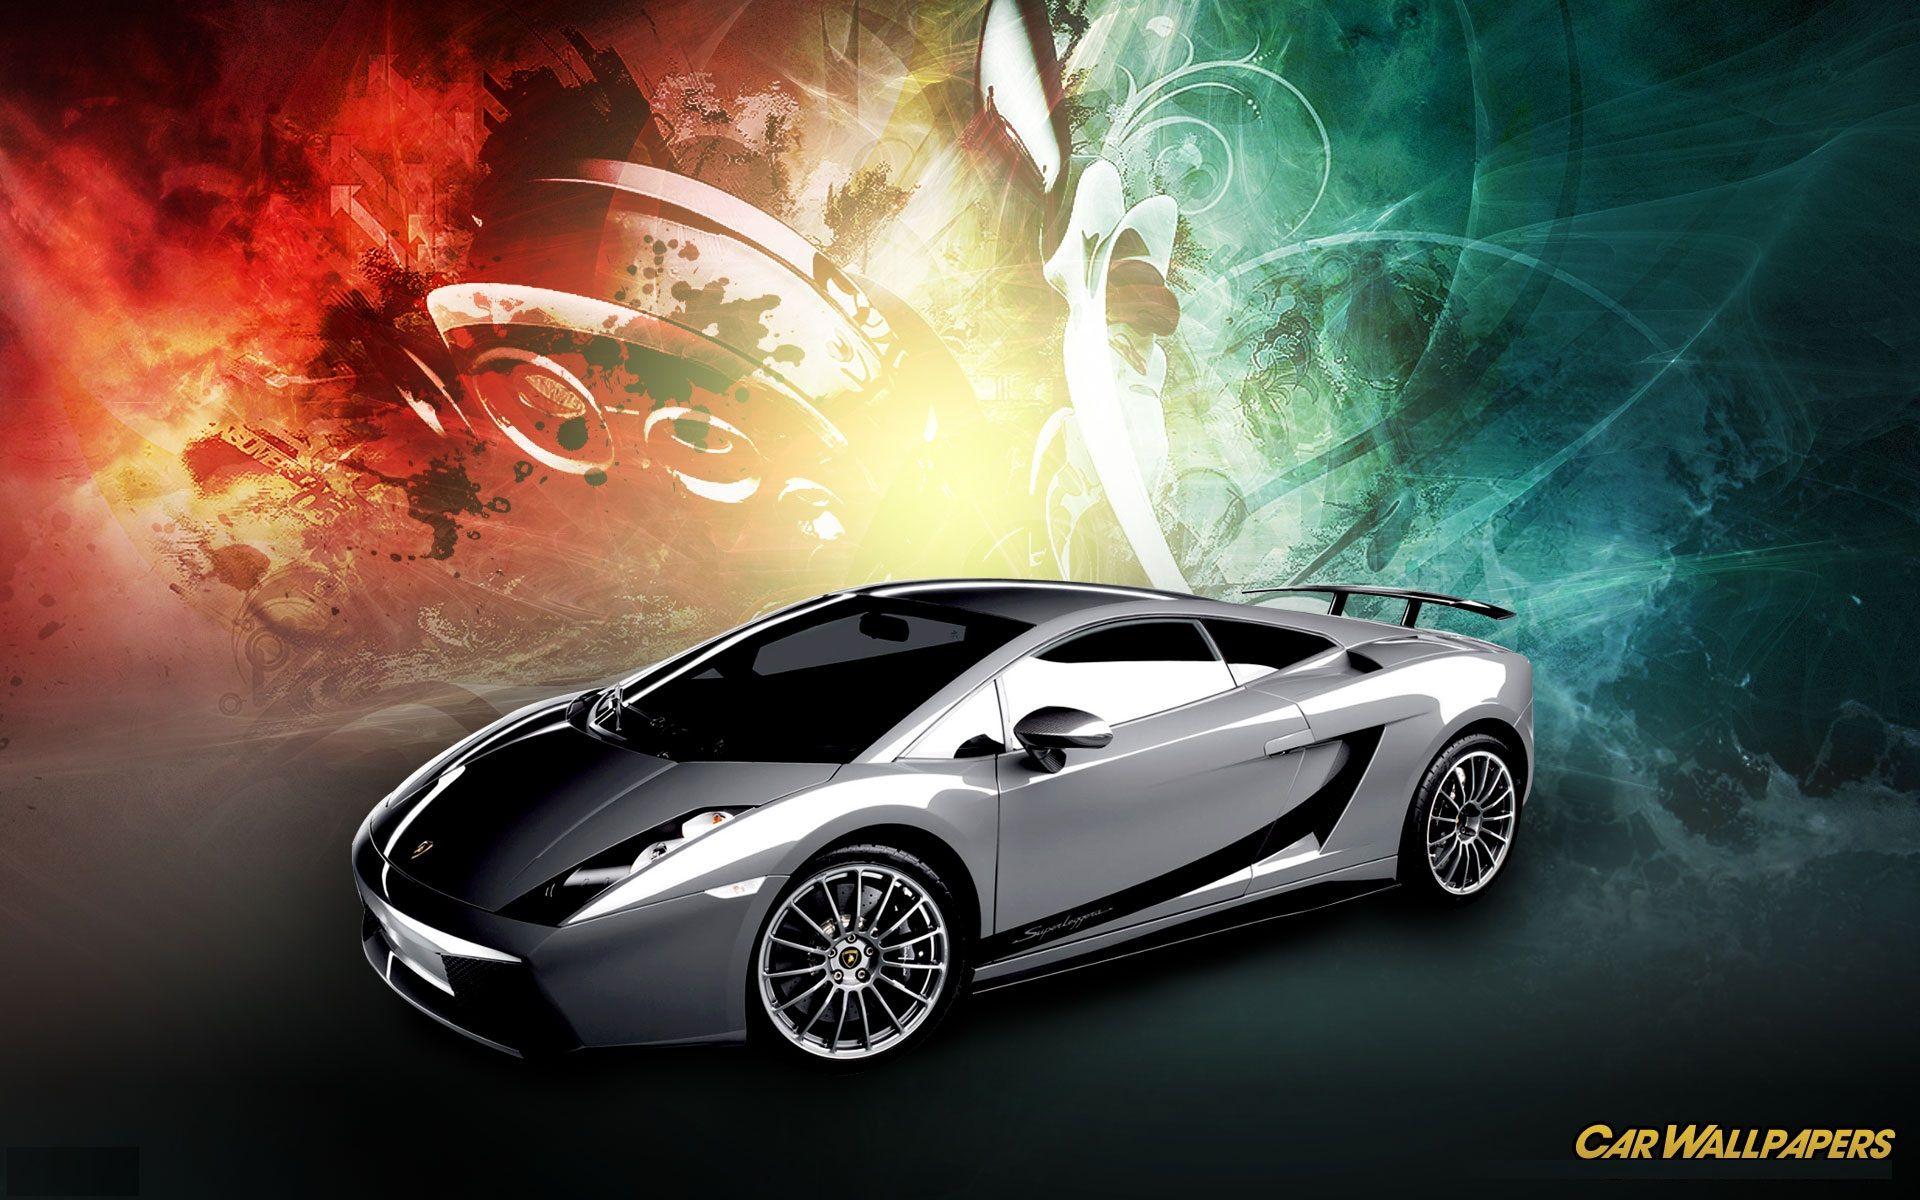 Attractive Abstract Silver Lamborghini HD Wallpaper For Desktop Backgrounds.